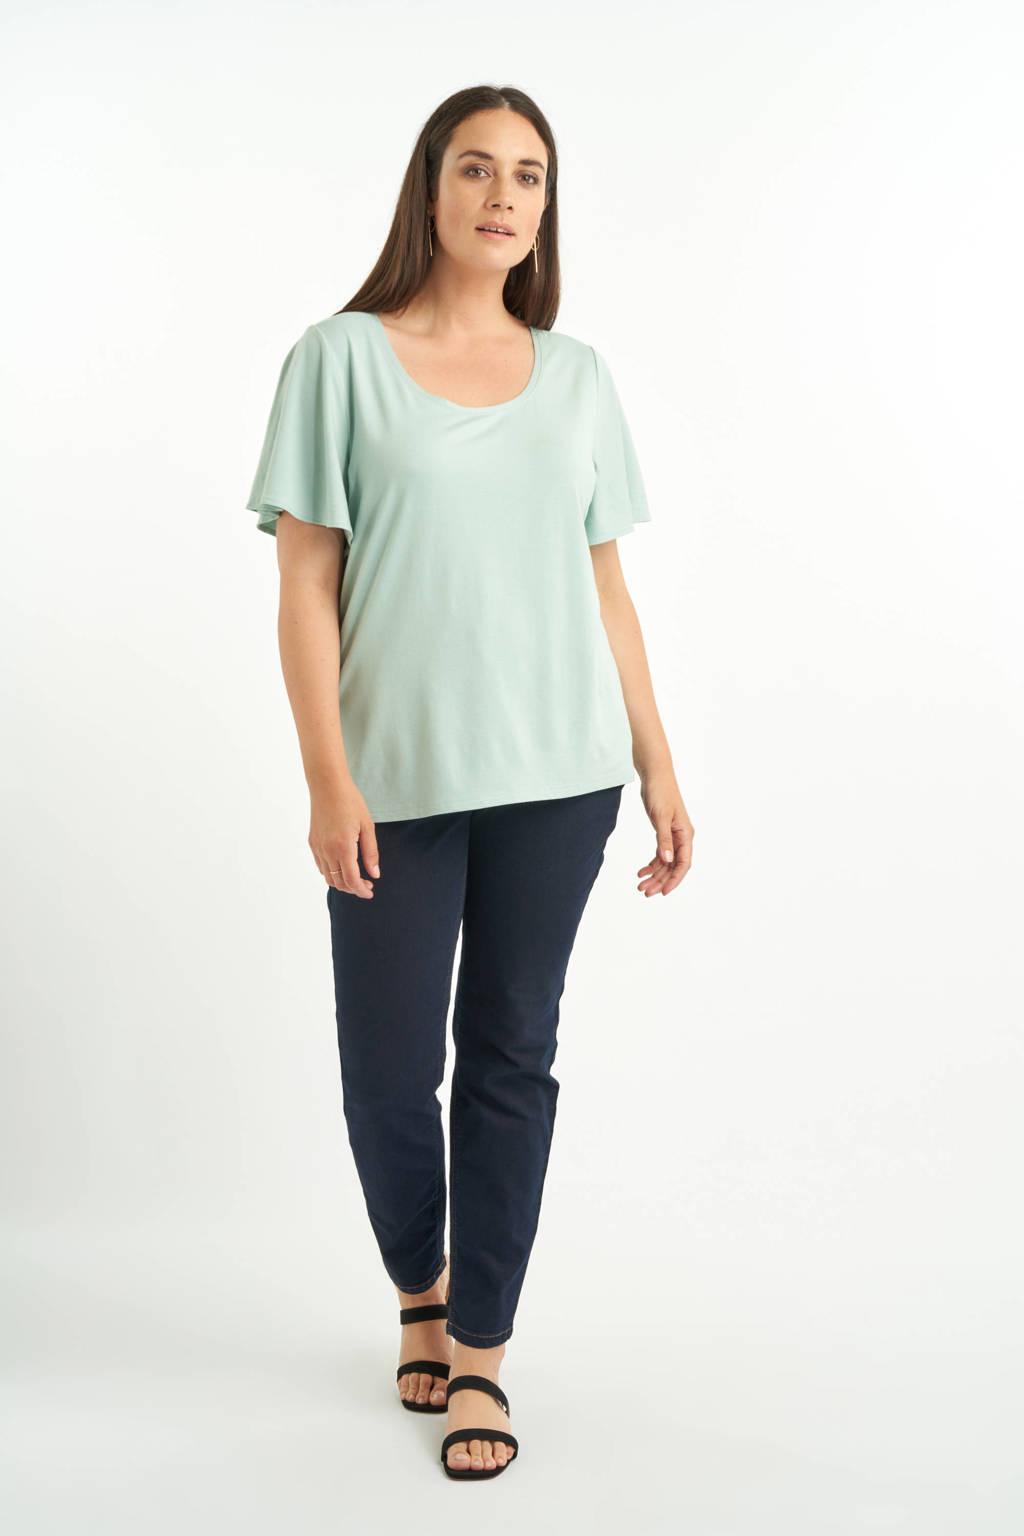 MS Mode T-shirt met volant mintgroen, Mintgroen